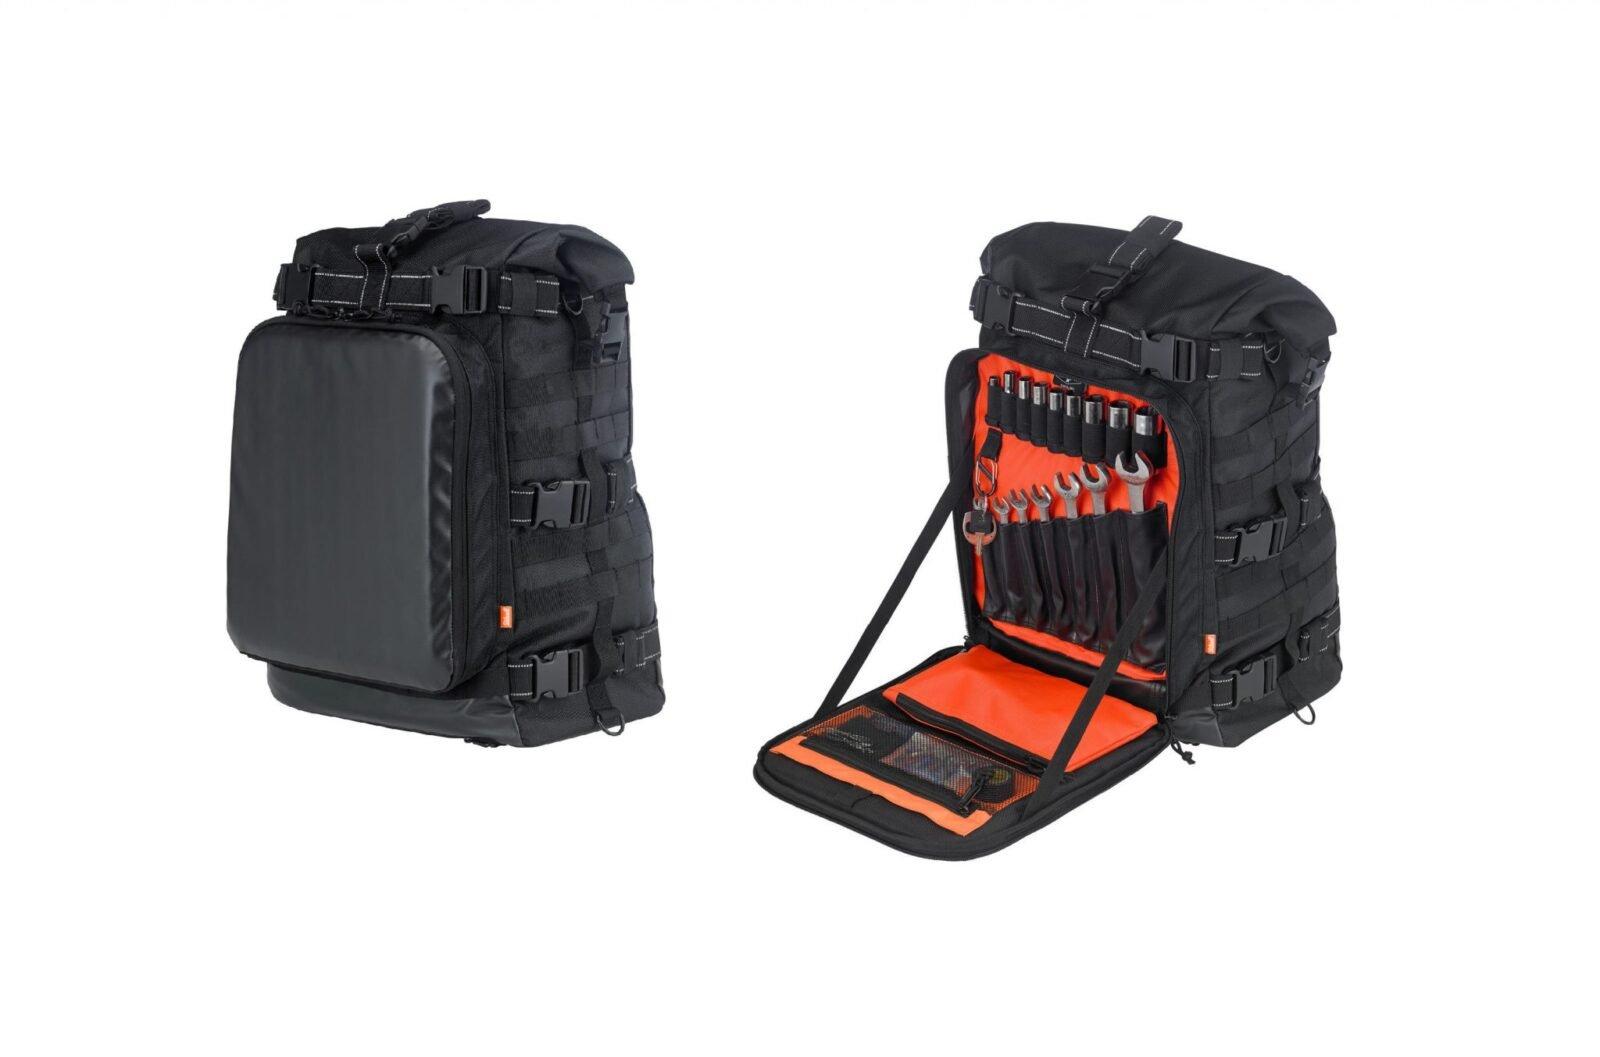 Biltwell EXFIL 80 Moto Bag 1600x1057 - Biltwell EXFIL-80 Moto Bag